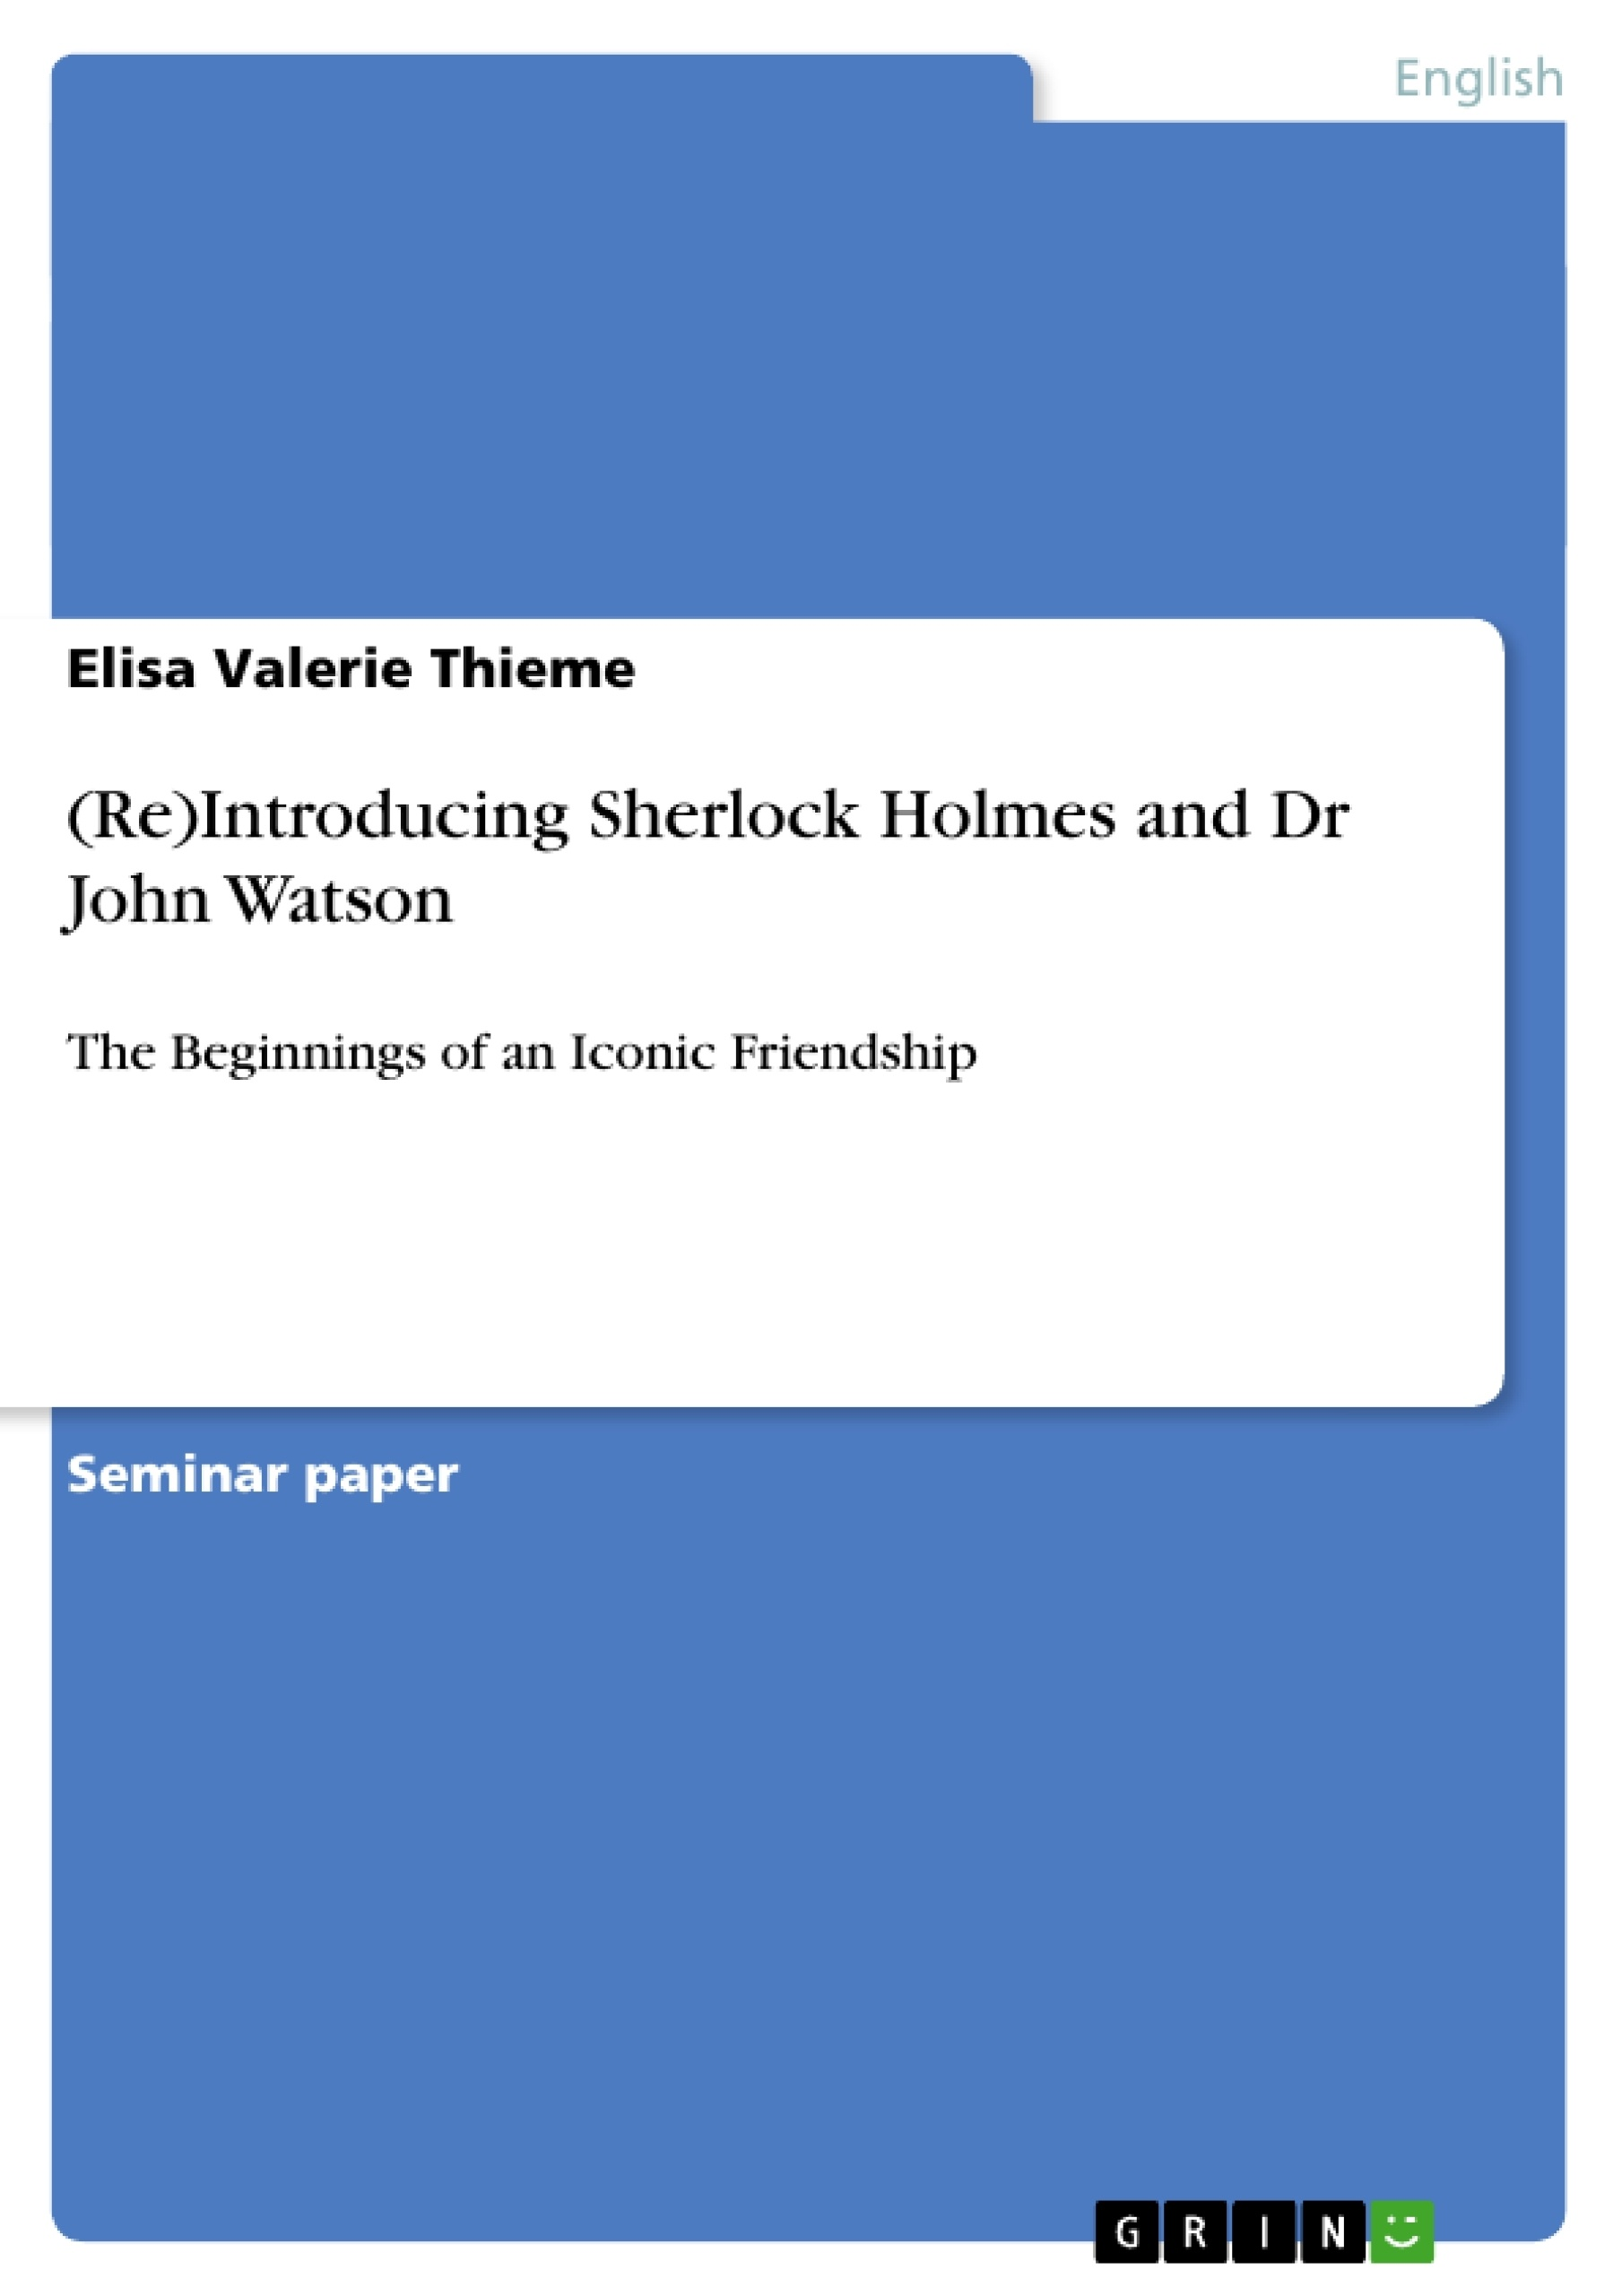 Title: (Re)Introducing Sherlock Holmes and Dr John Watson